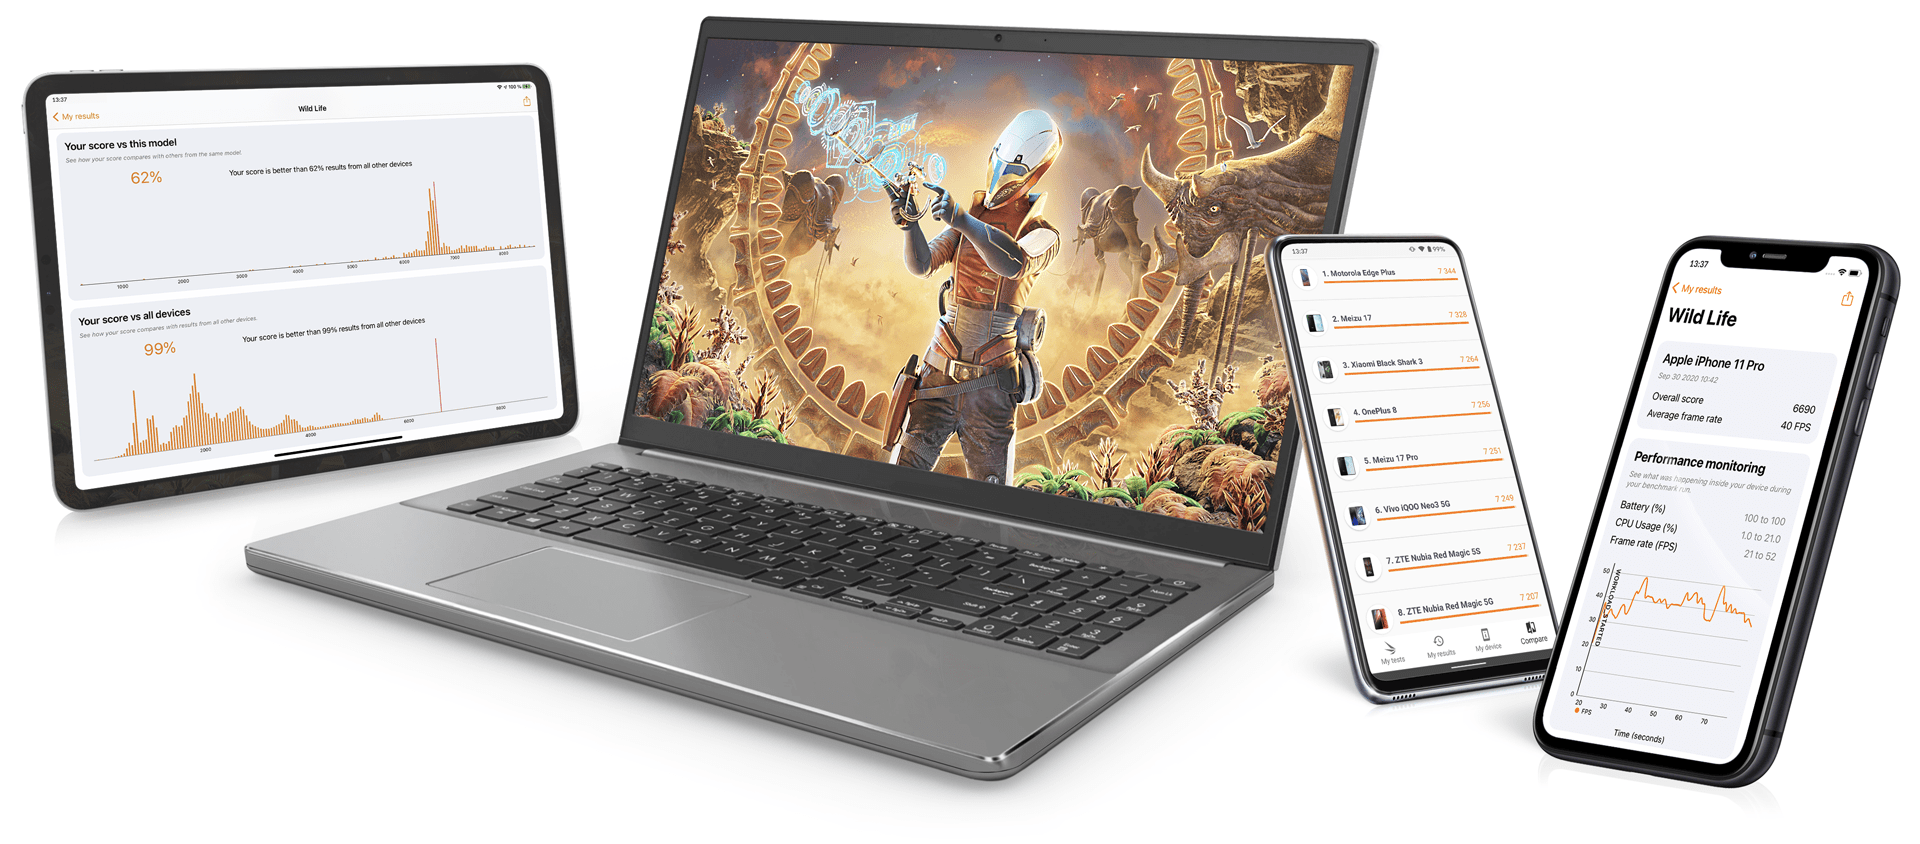 Xiaomi製品の多くが3DMarkでの計測が出来ず、UL Benchmarksが名指しでFAQに掲載